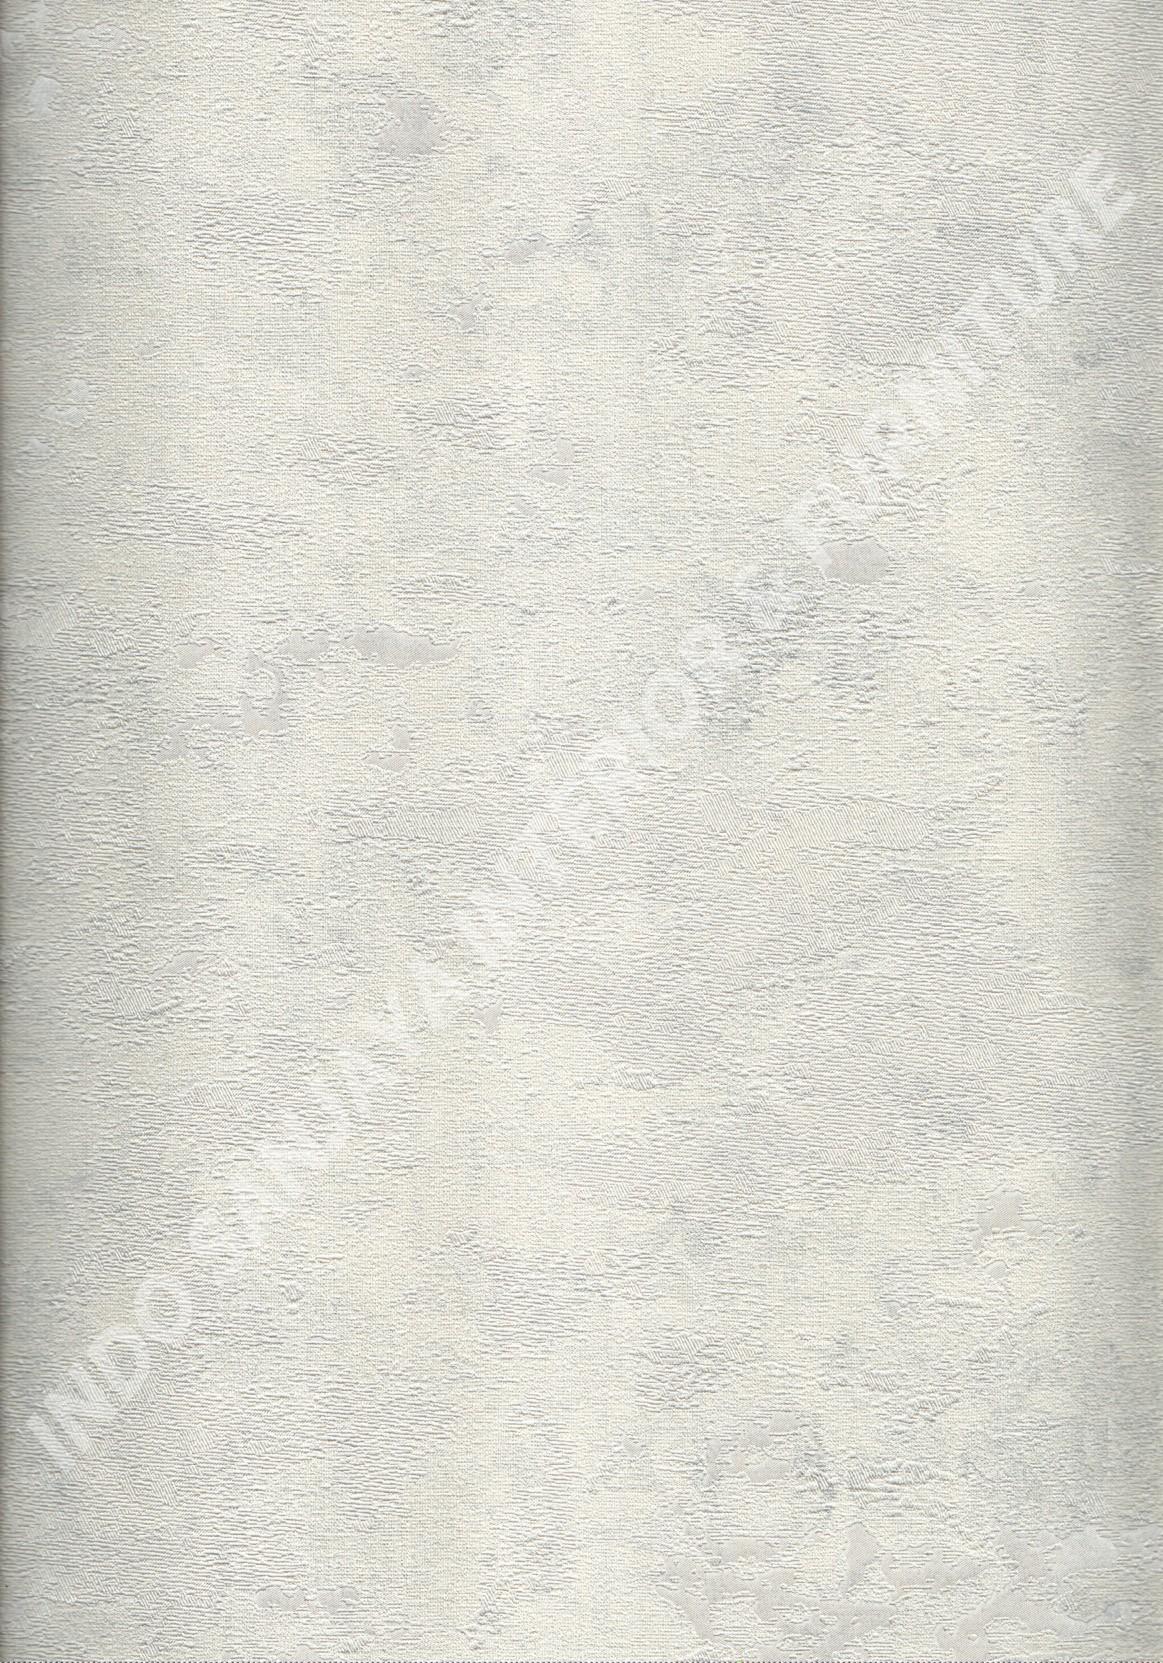 wallpaper   Wallpaper Minimalis Polos 5007-3:5007-3 corak  warna